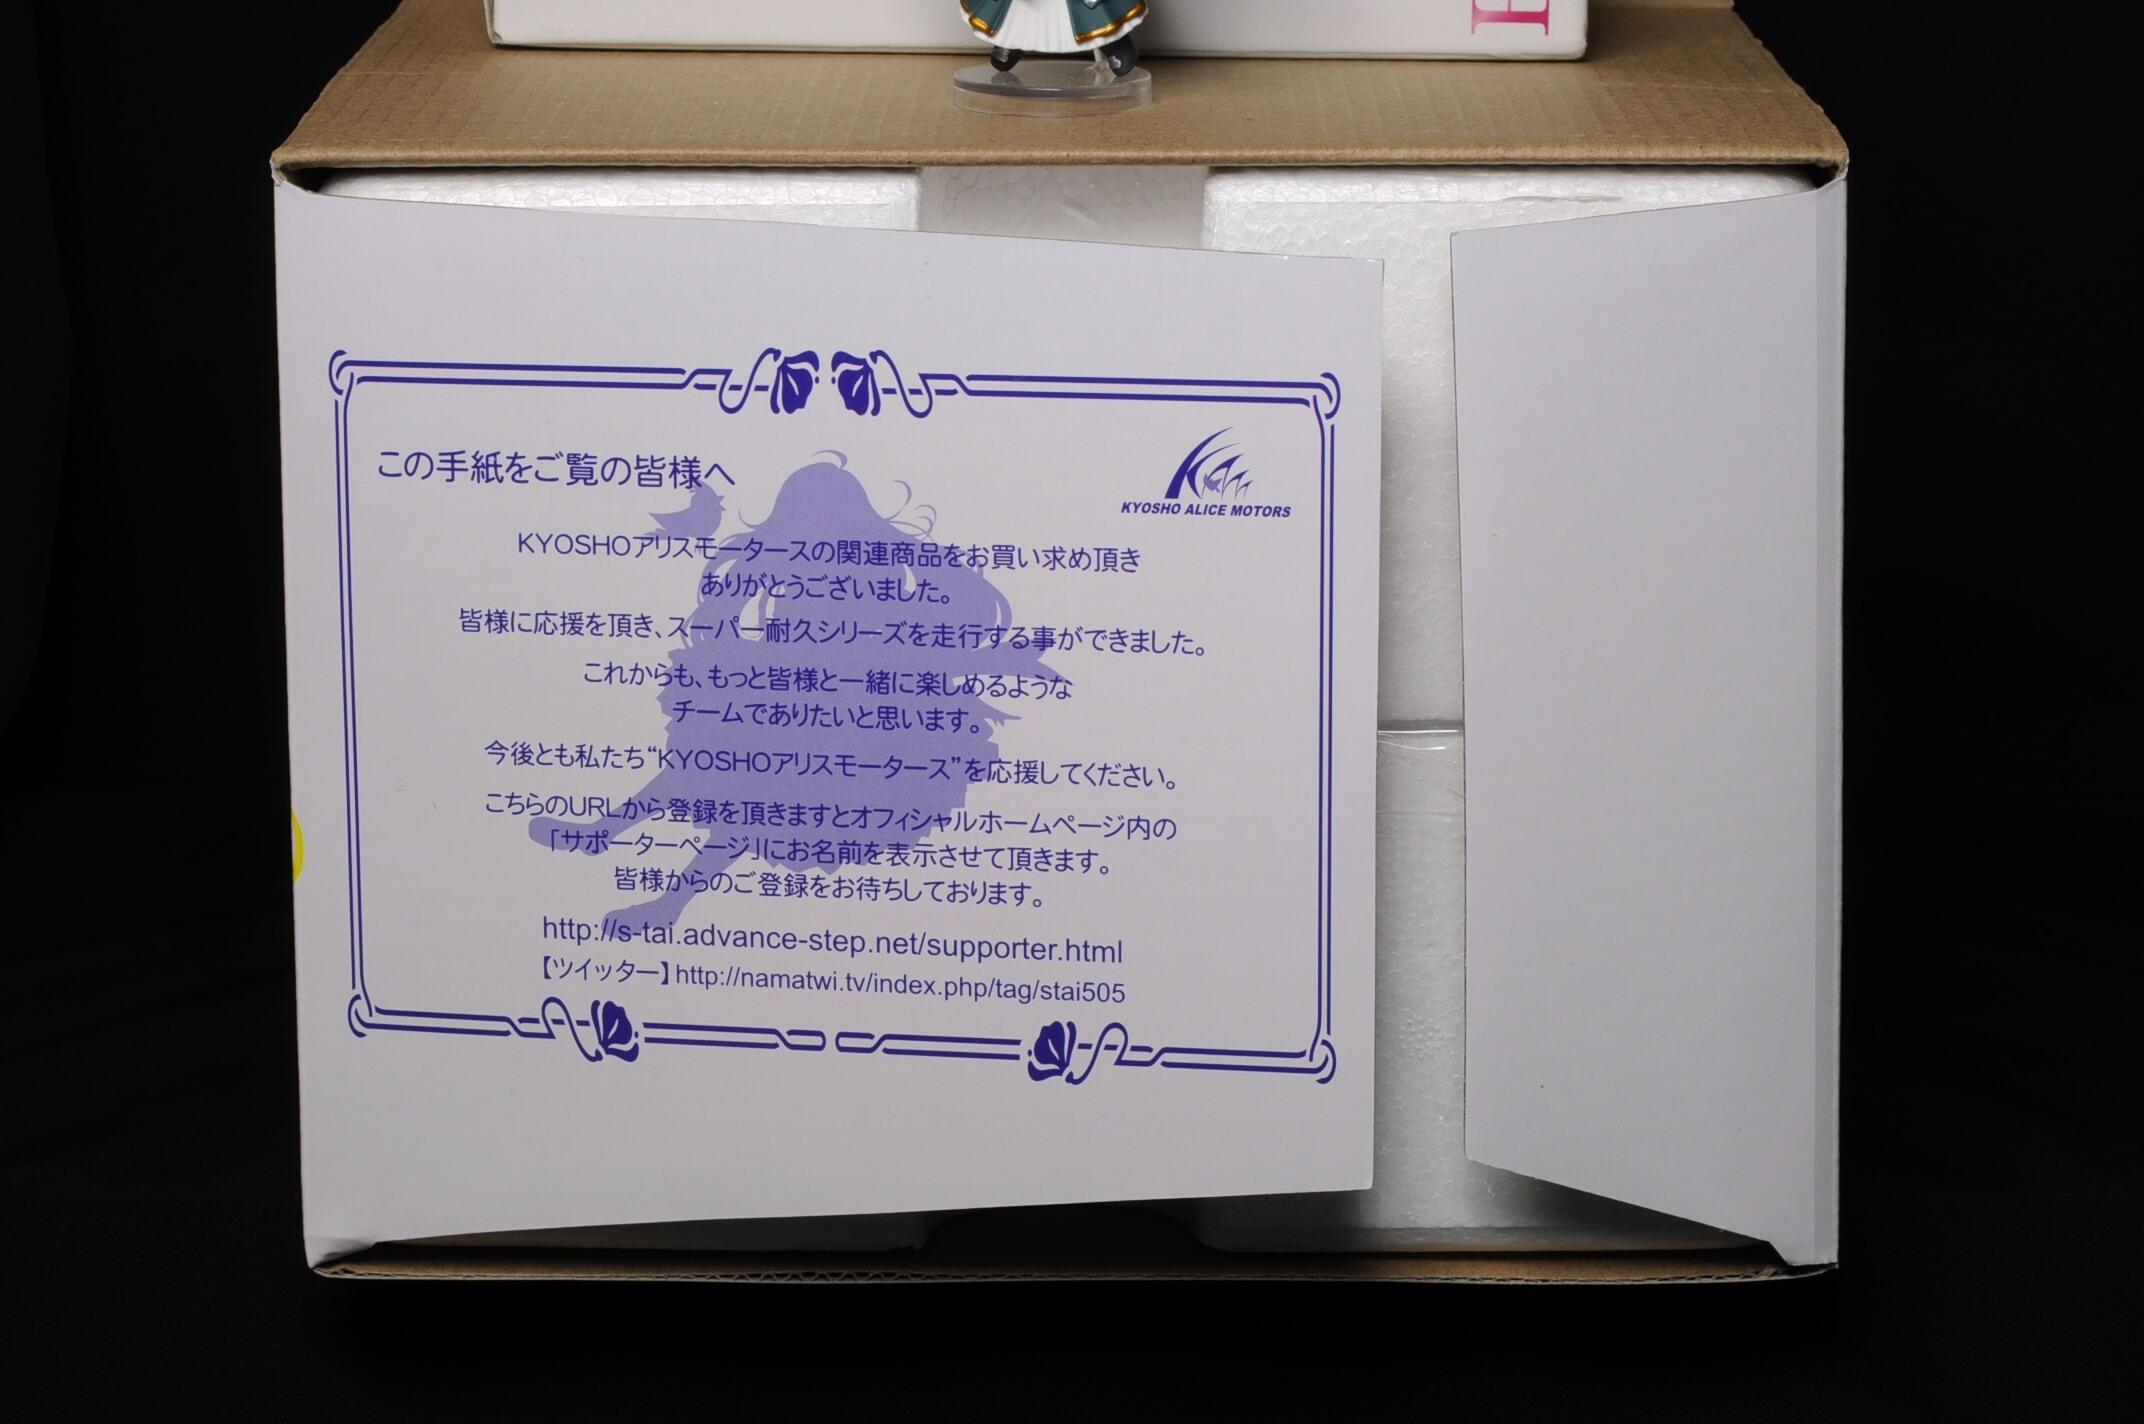 DSC_0006_20110827202647.jpg